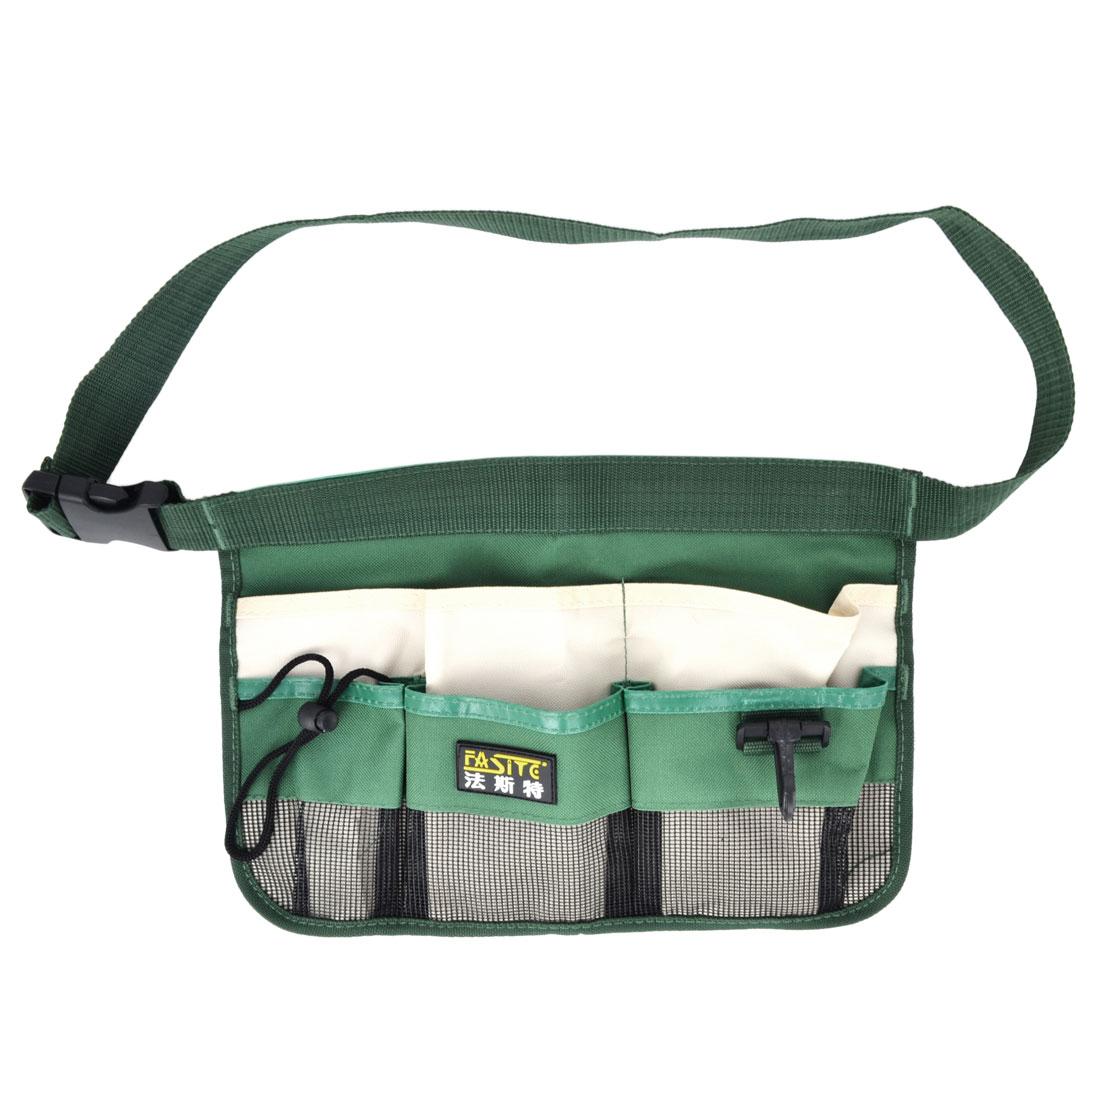 Release Buckle Green Nylon Oxford Gardens Tool Holder Waist Bag